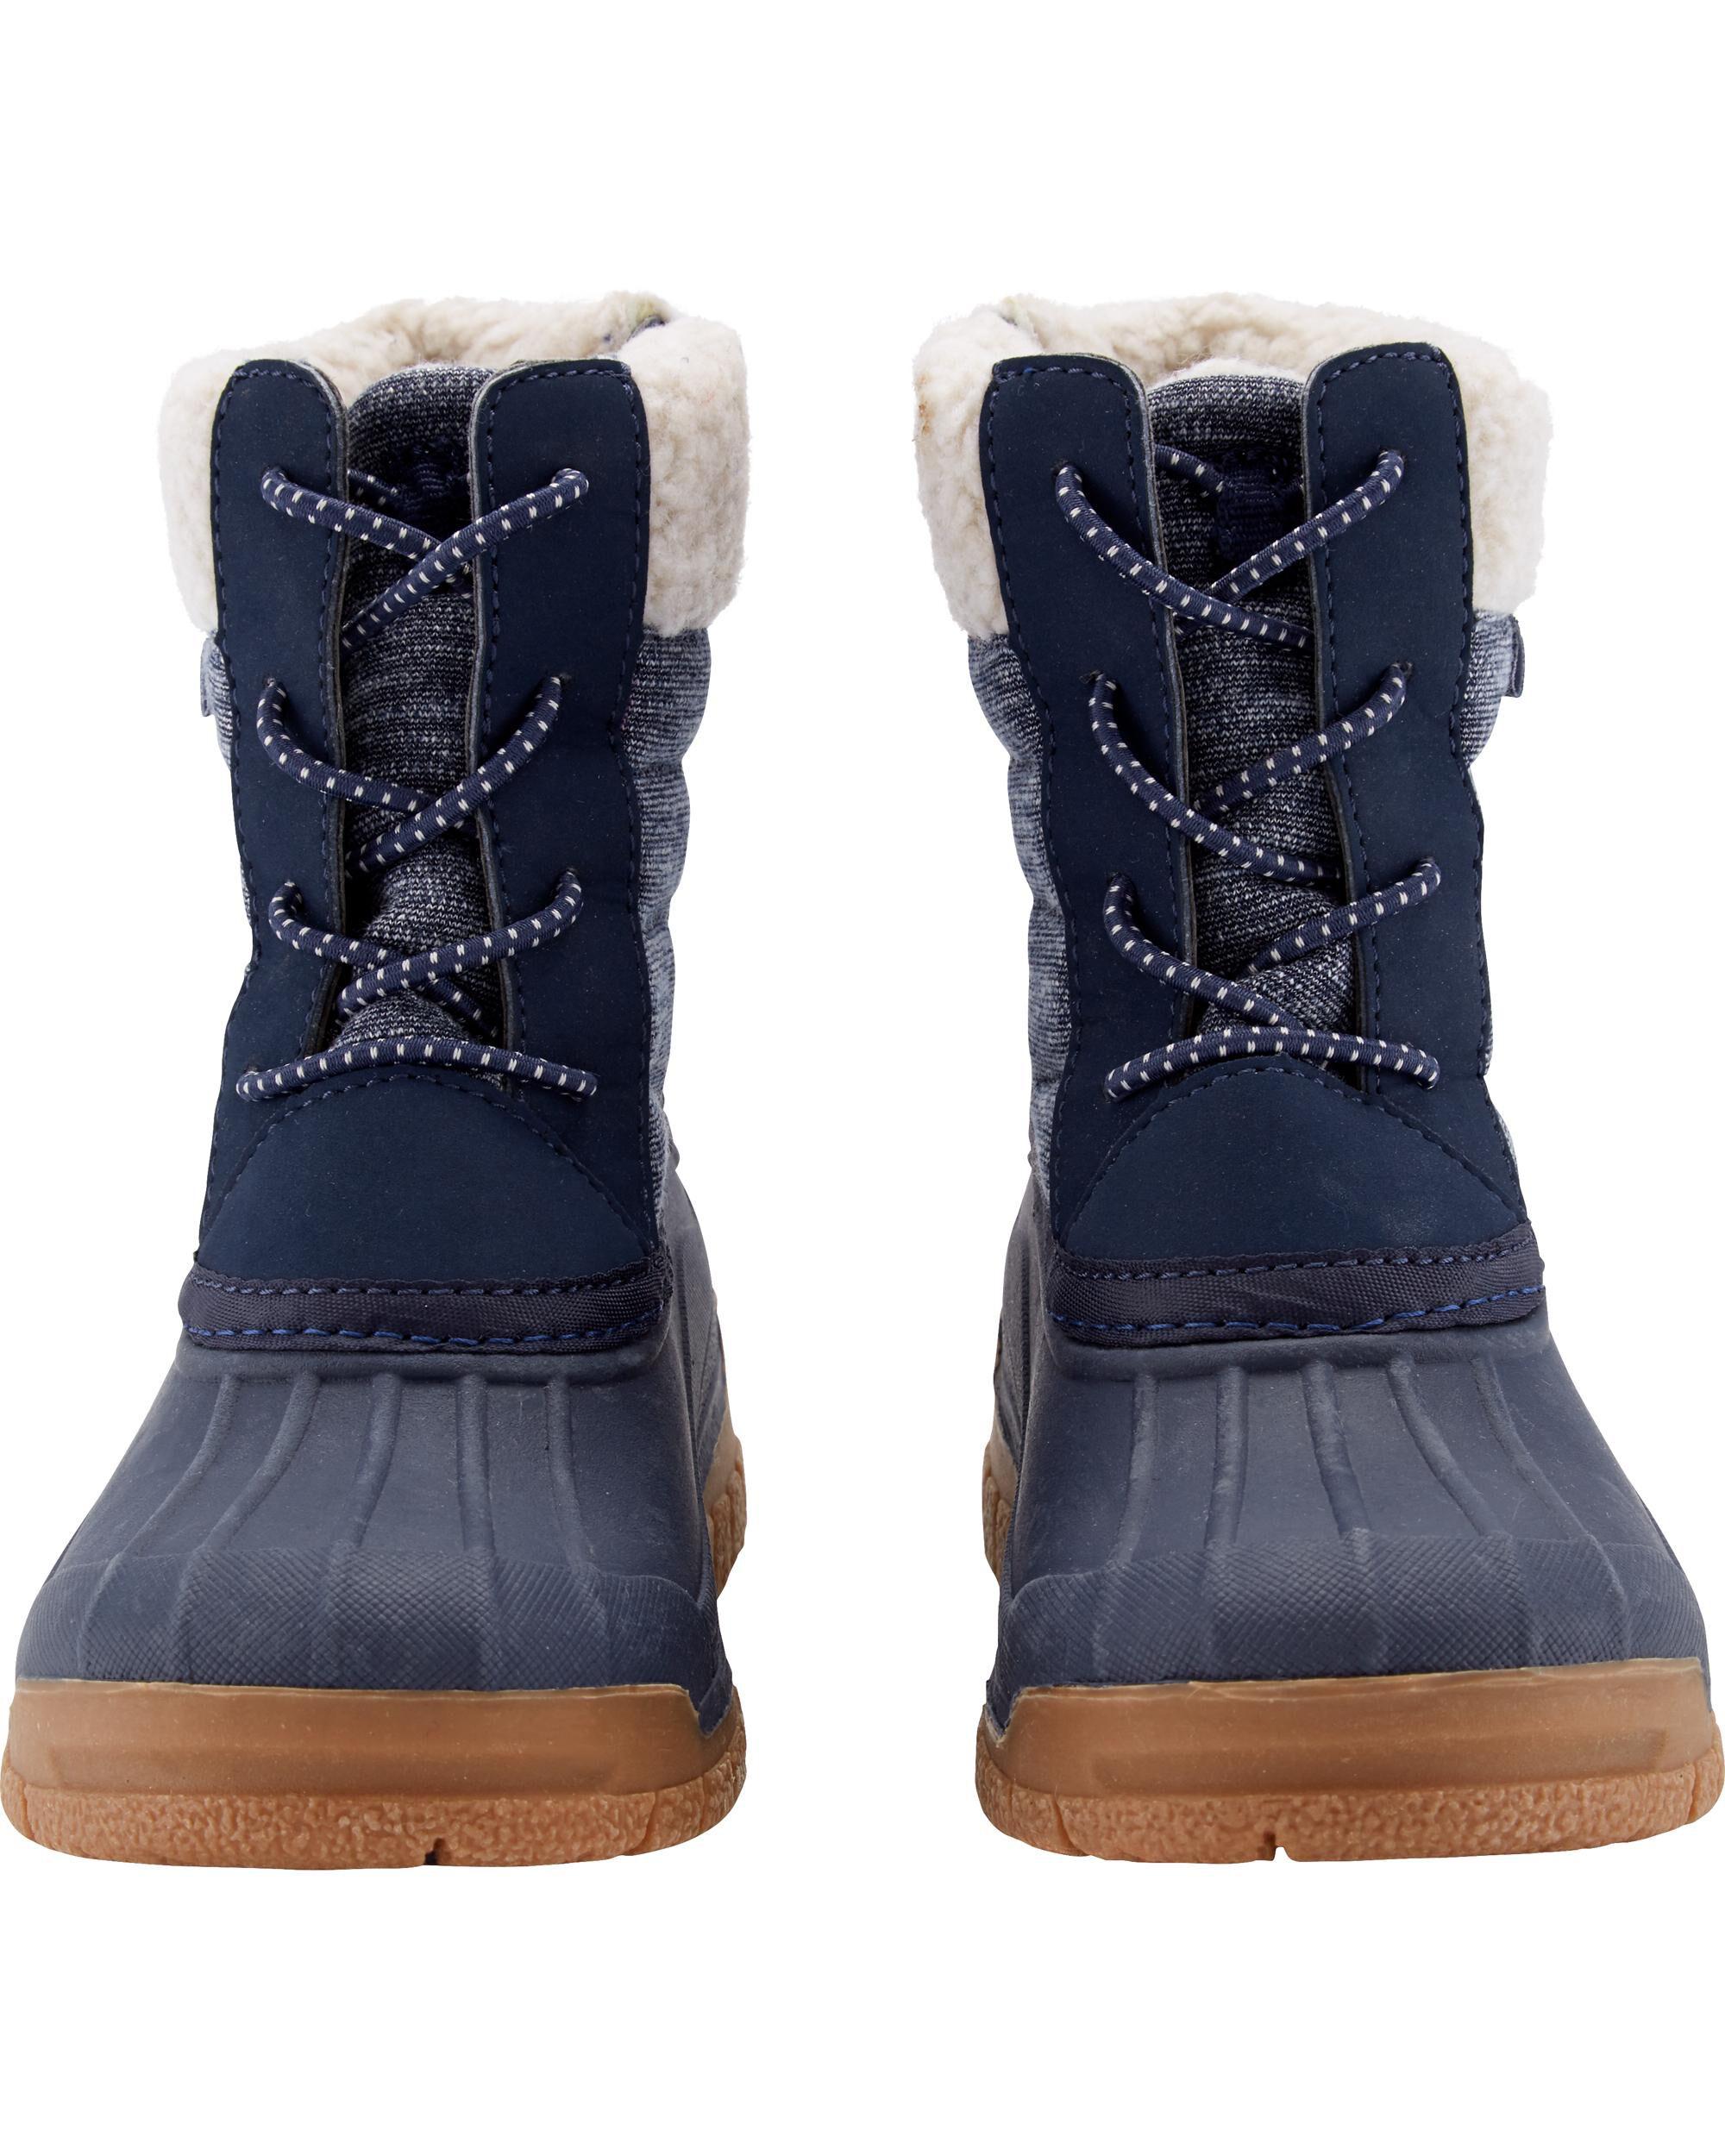 OshKosh Snow Boots   carters.com